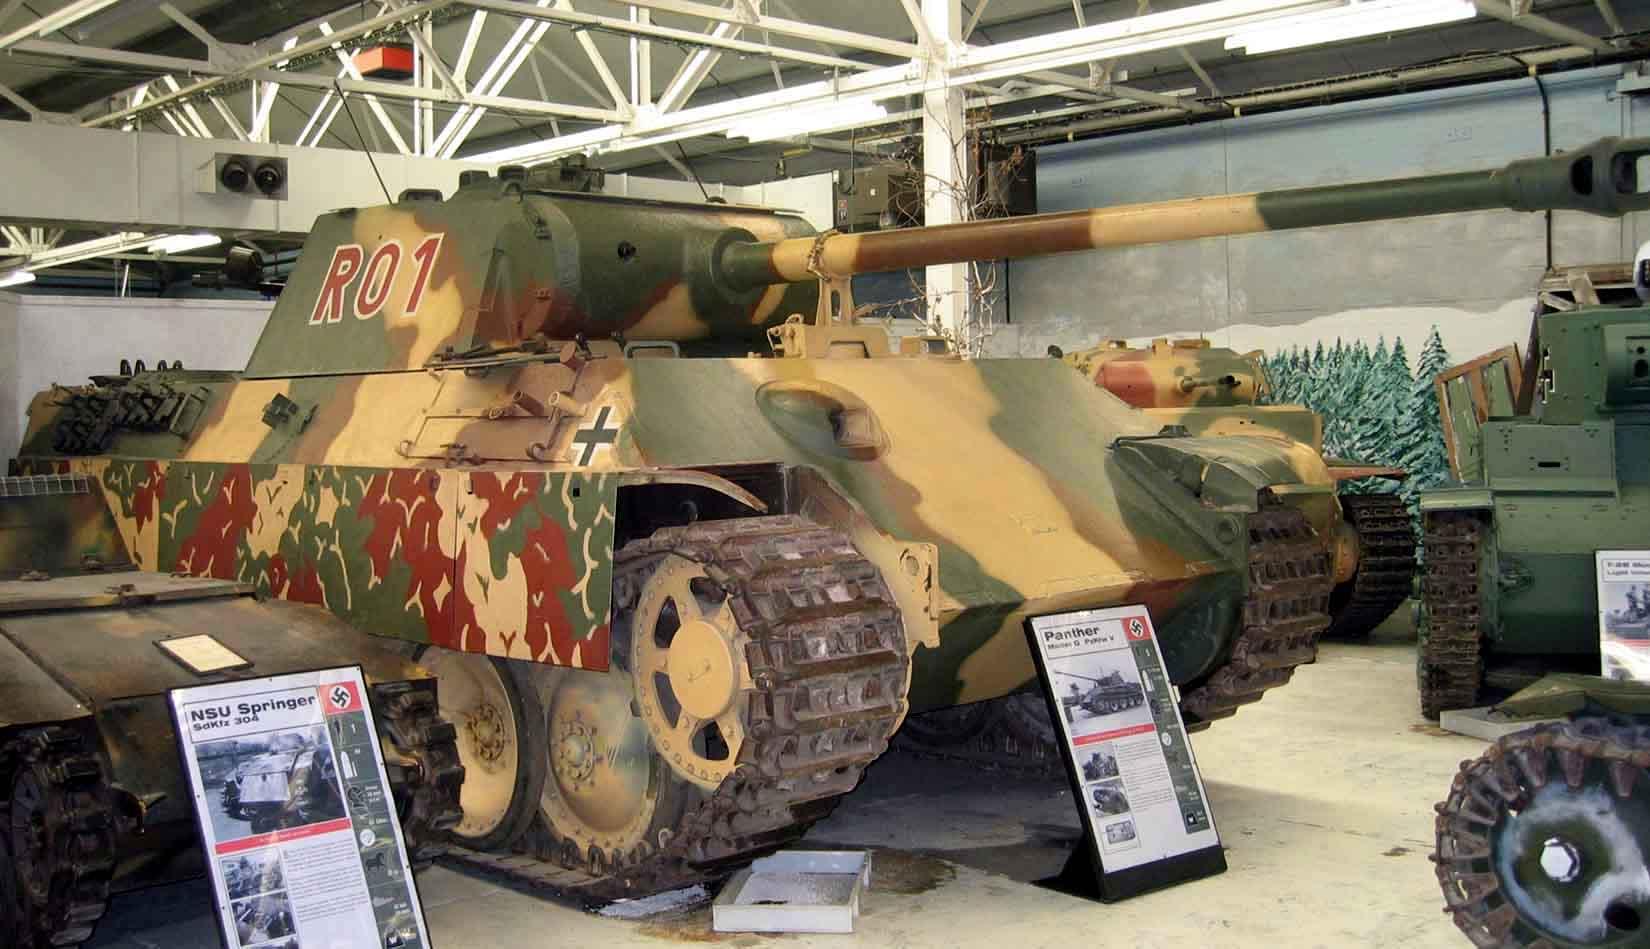 http://upload.wikimedia.org/wikipedia/commons/c/c5/Panther_Tank,_Bovington.jpg